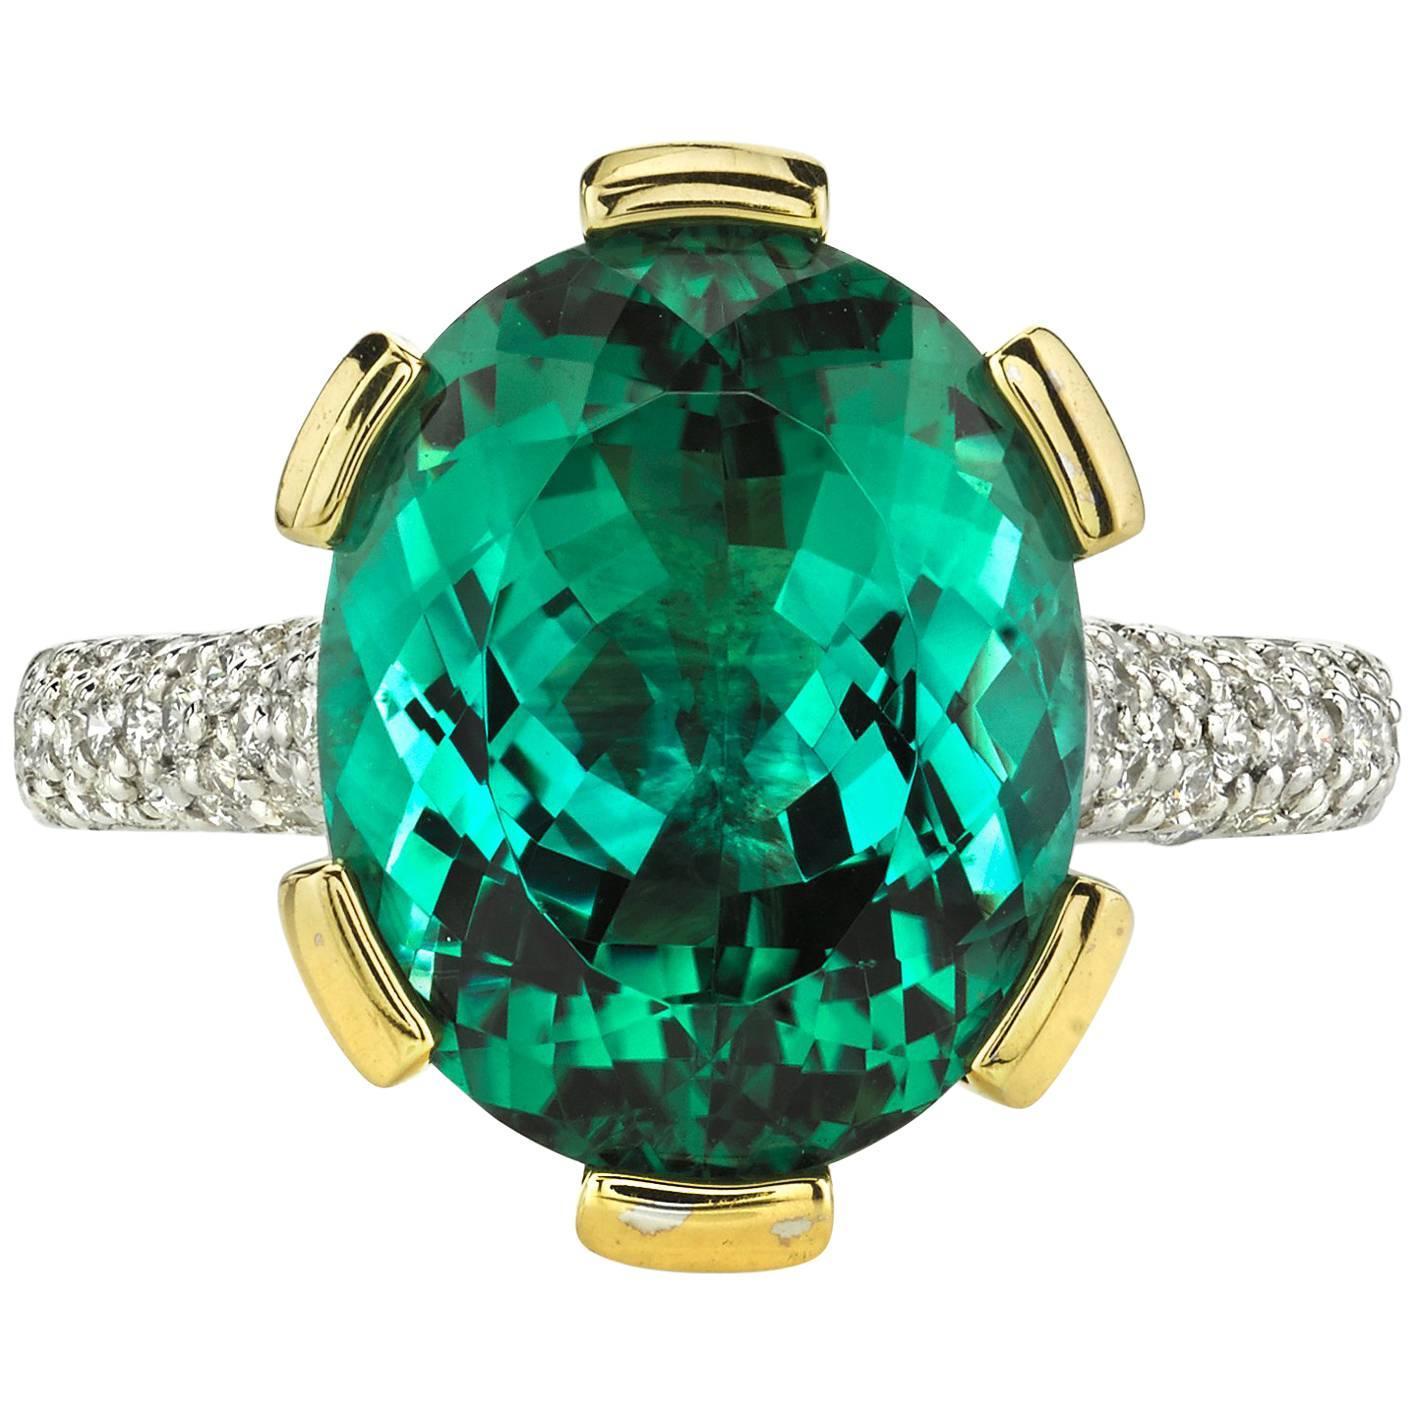 GIA Certified Blue-Green Tourmaline Diamond Gold Cocktail Ring